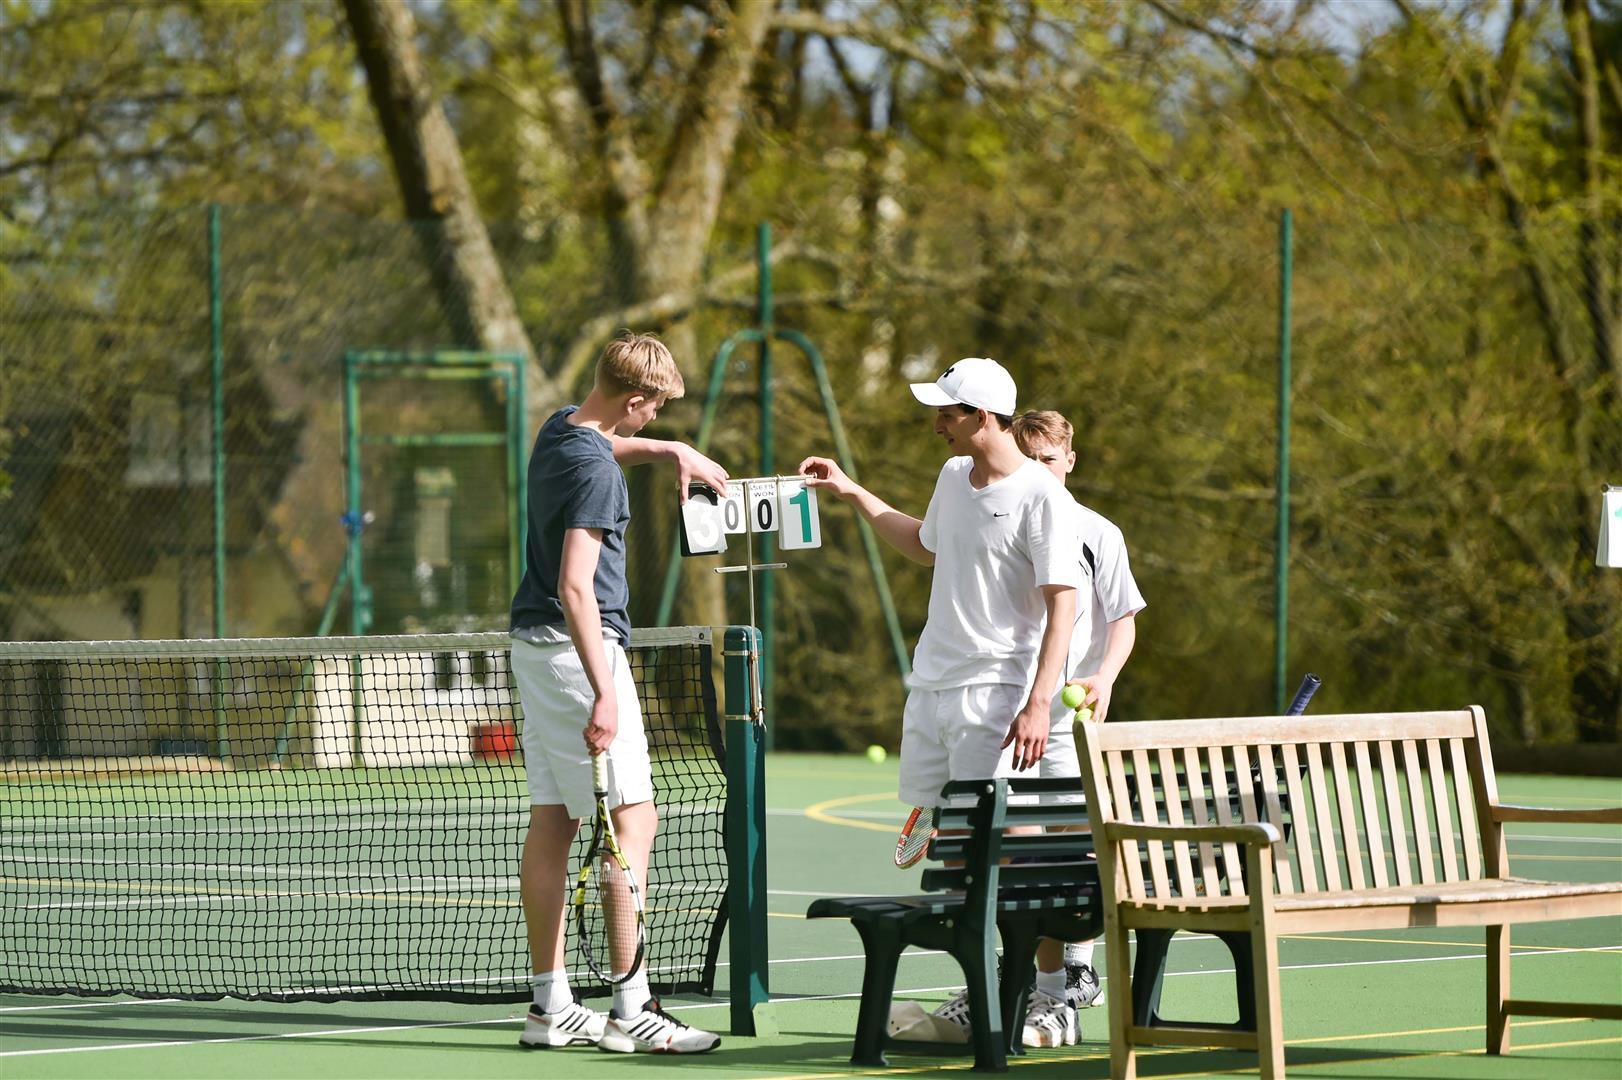 Magdalene Tennis Club